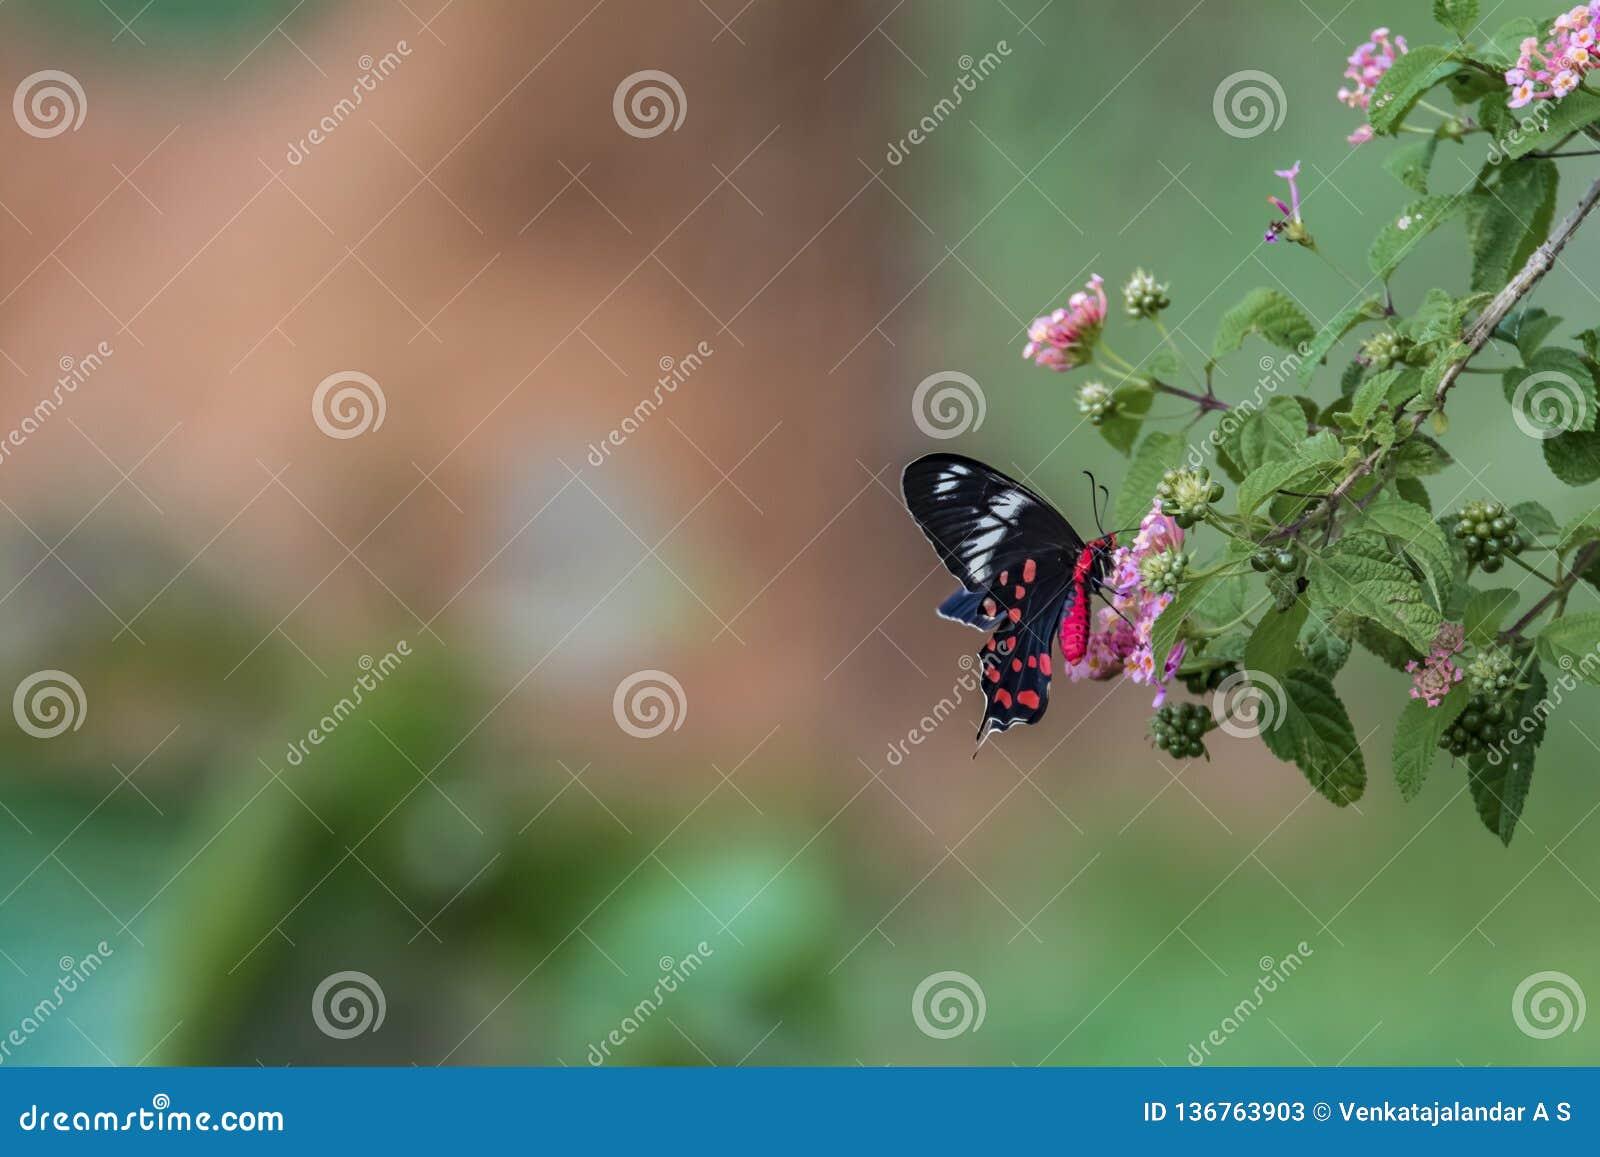 Fanfaron de Pachliopta, le papillon rose cramoisi